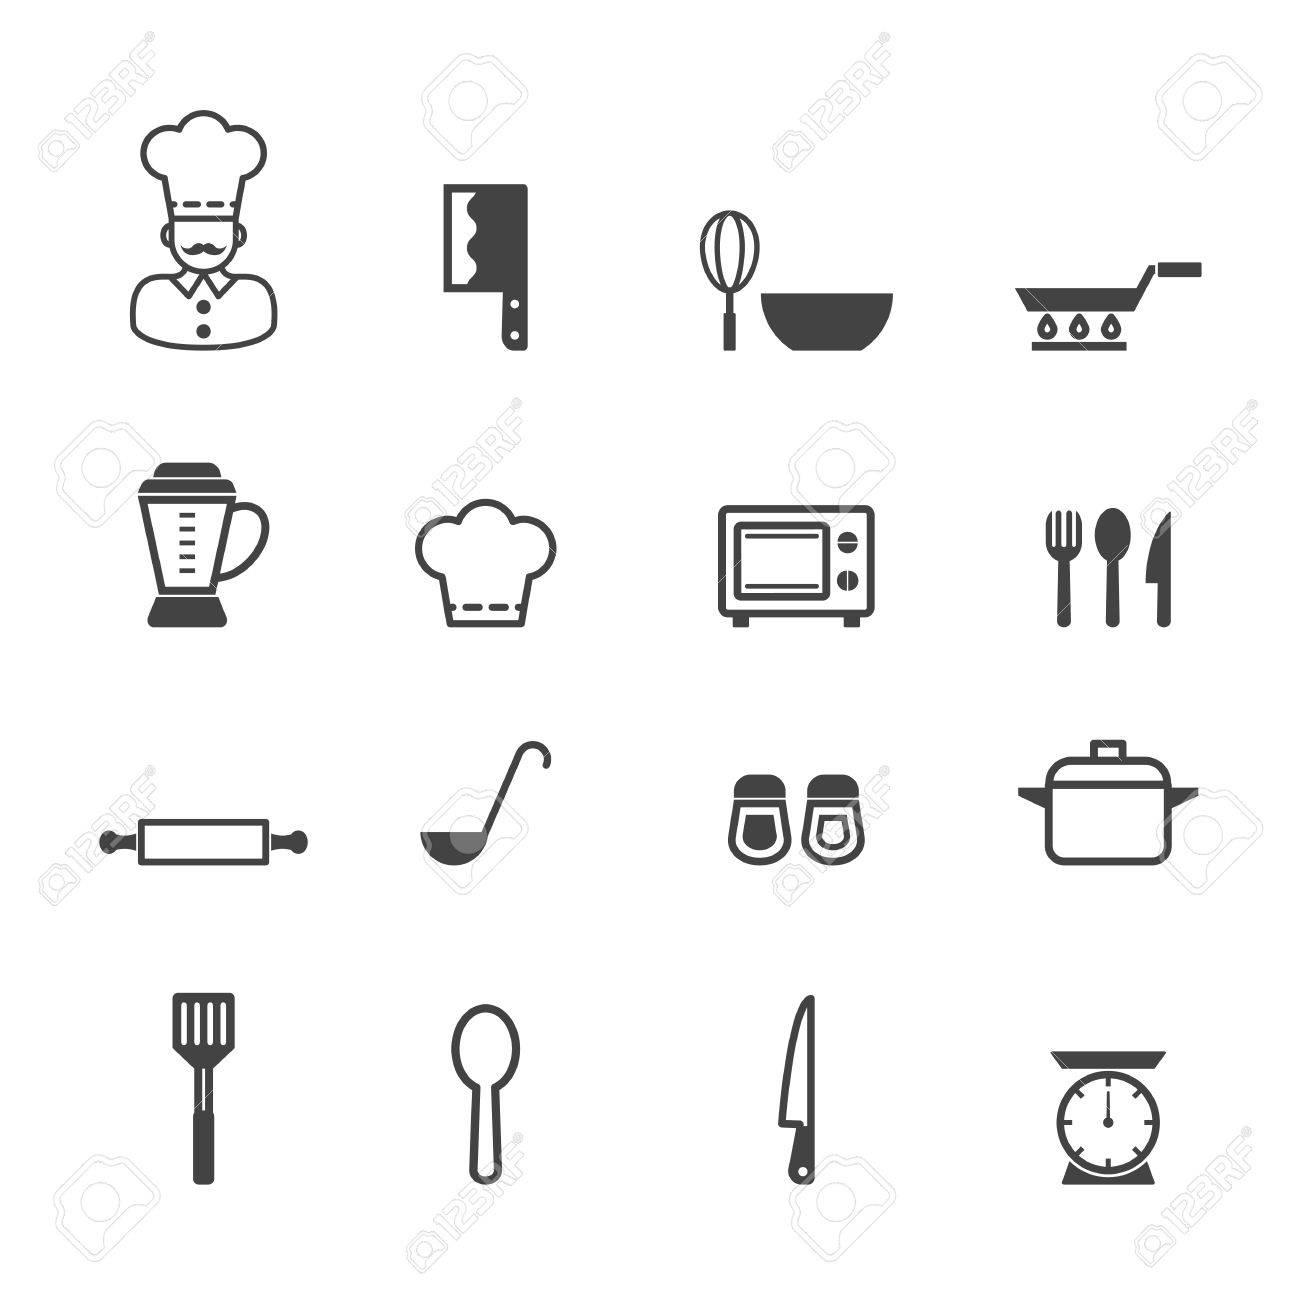 Küche Symbole | Kuche Icons Mono Vektor Symbole Lizenzfrei Nutzbare Vektorgrafiken